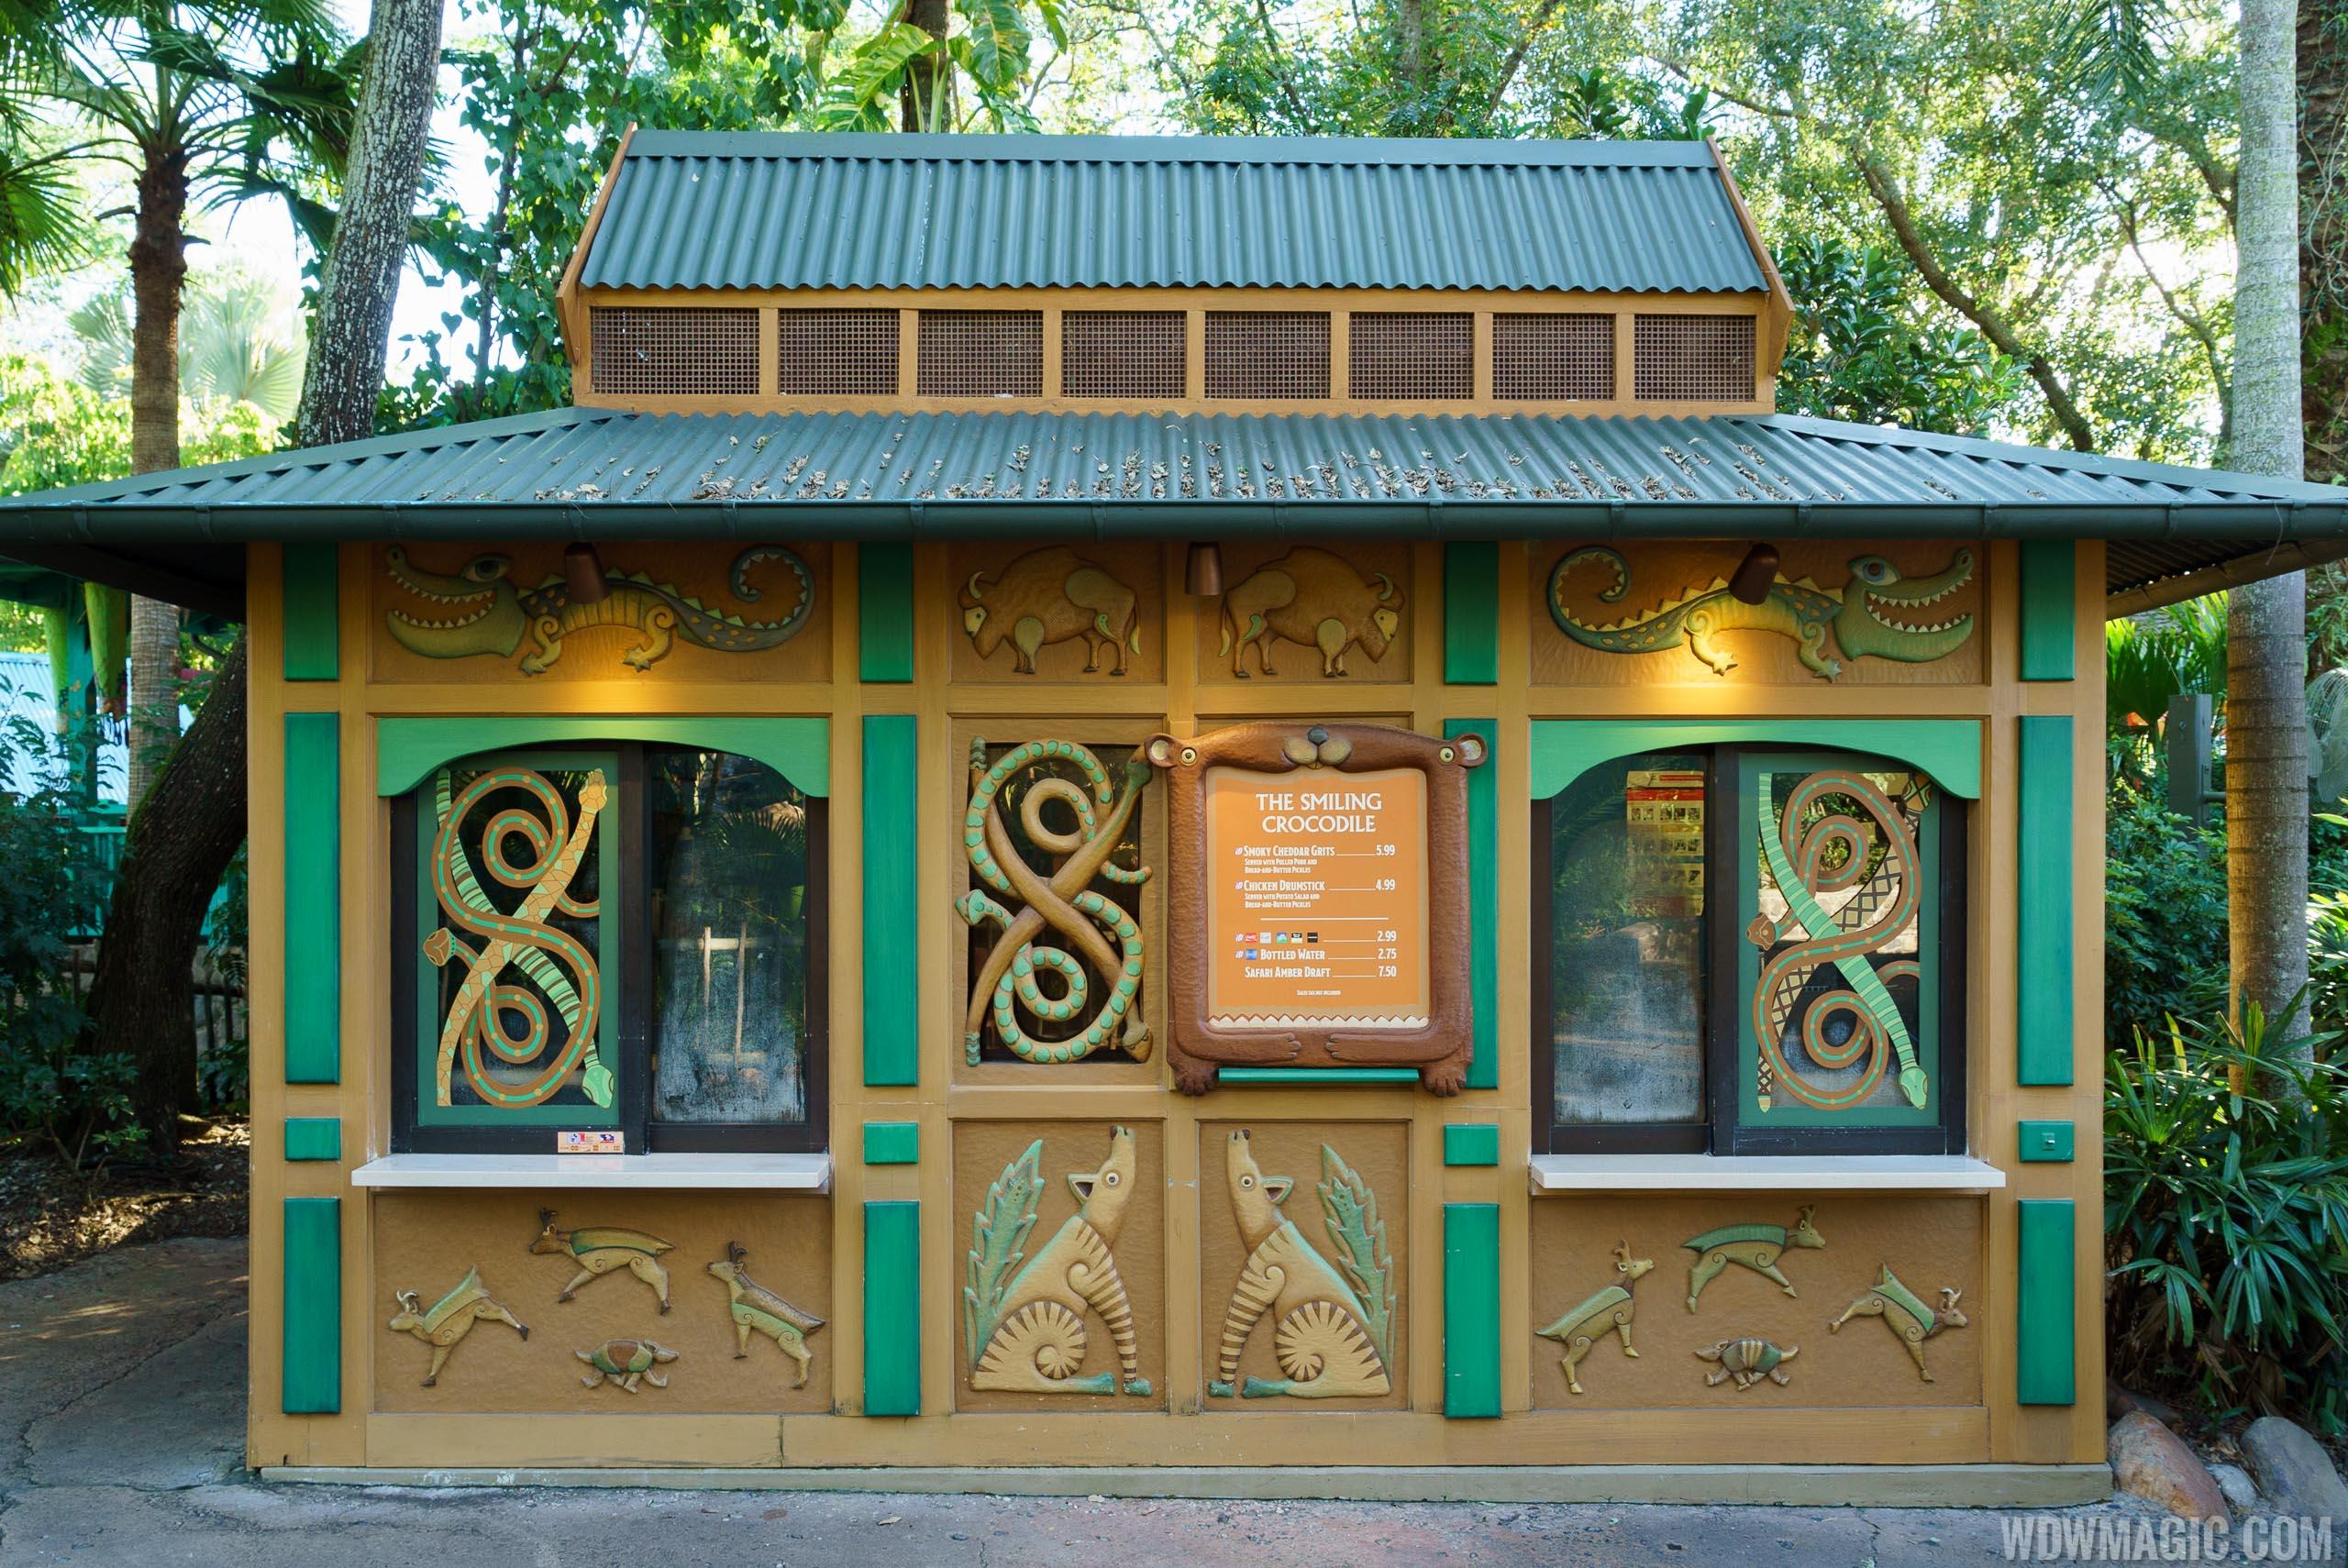 The Smiling Crocodile kiosk